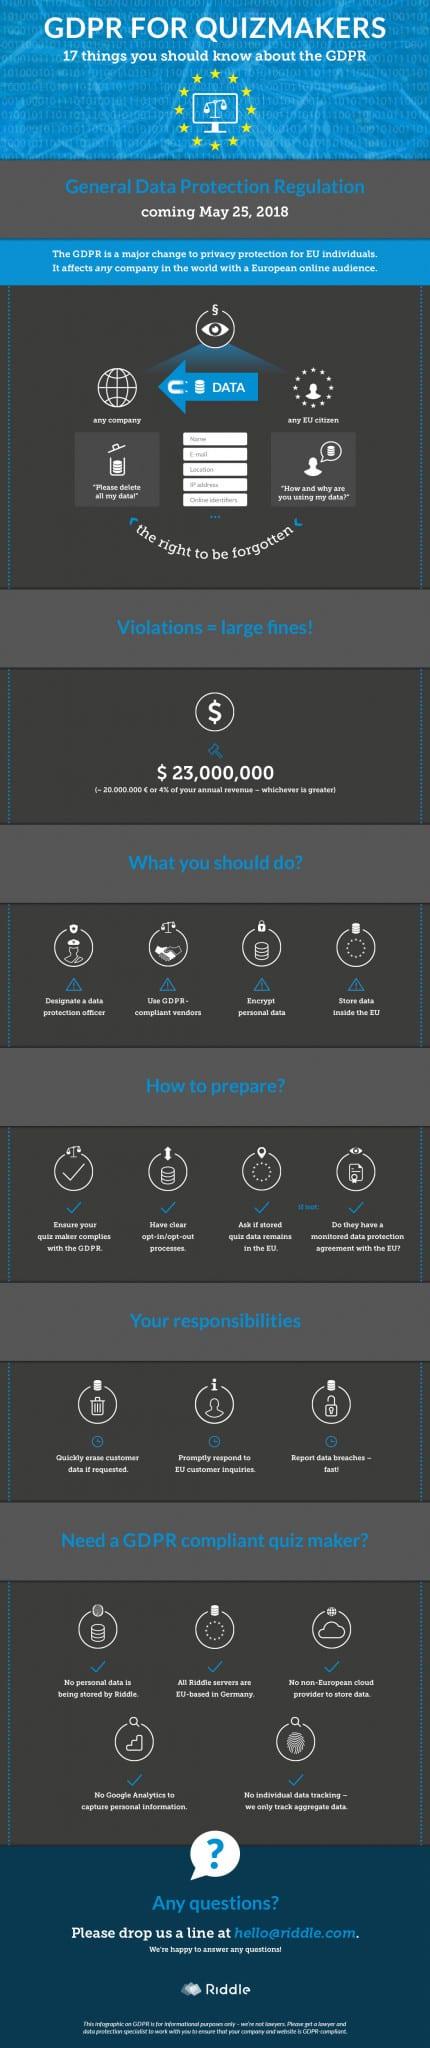 GPDR quiz maker infographic